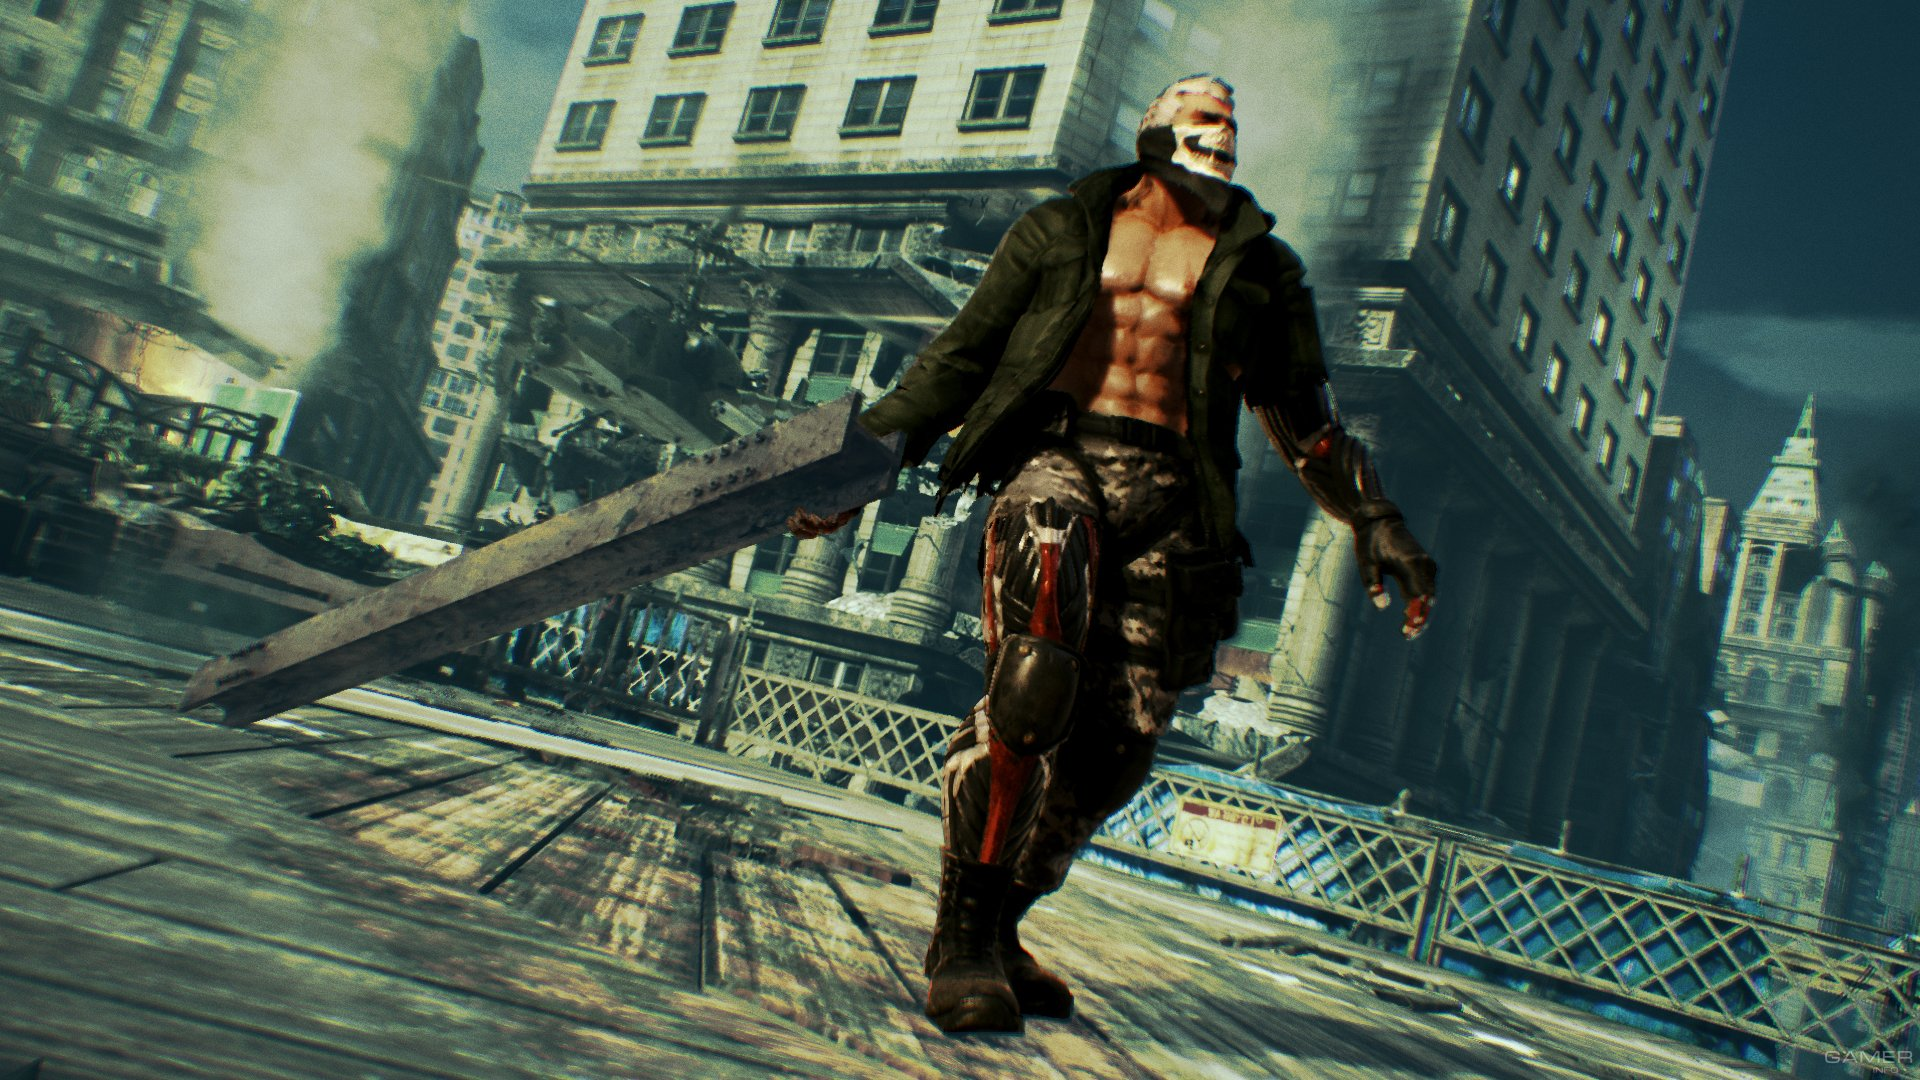 Tekken 7: Fated Retribution (2015 video game)